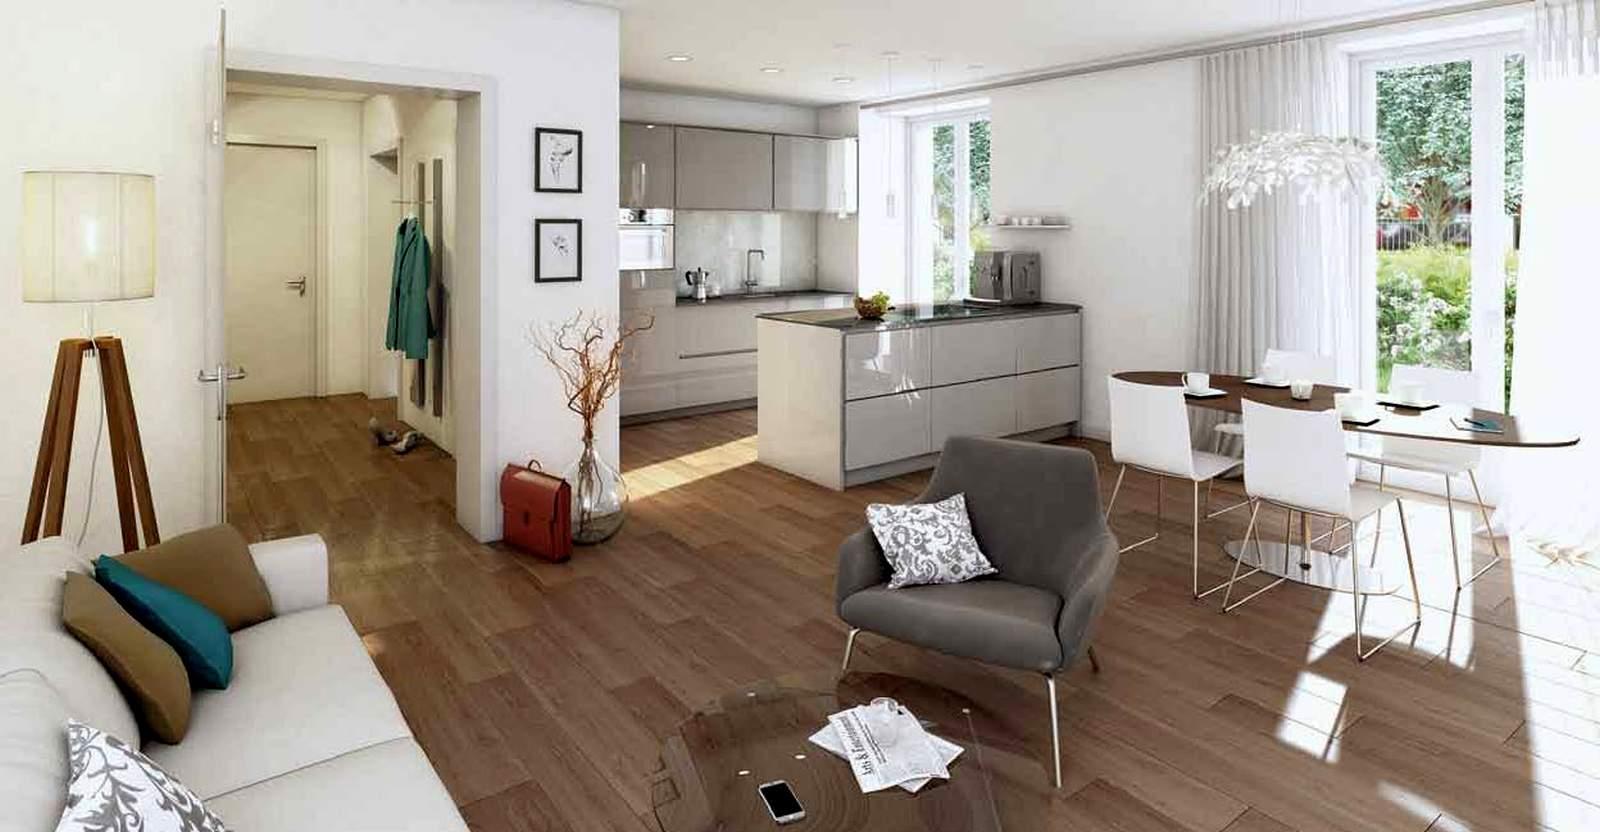 maria hilf areal freiburg denkmalschutz immobilien. Black Bedroom Furniture Sets. Home Design Ideas